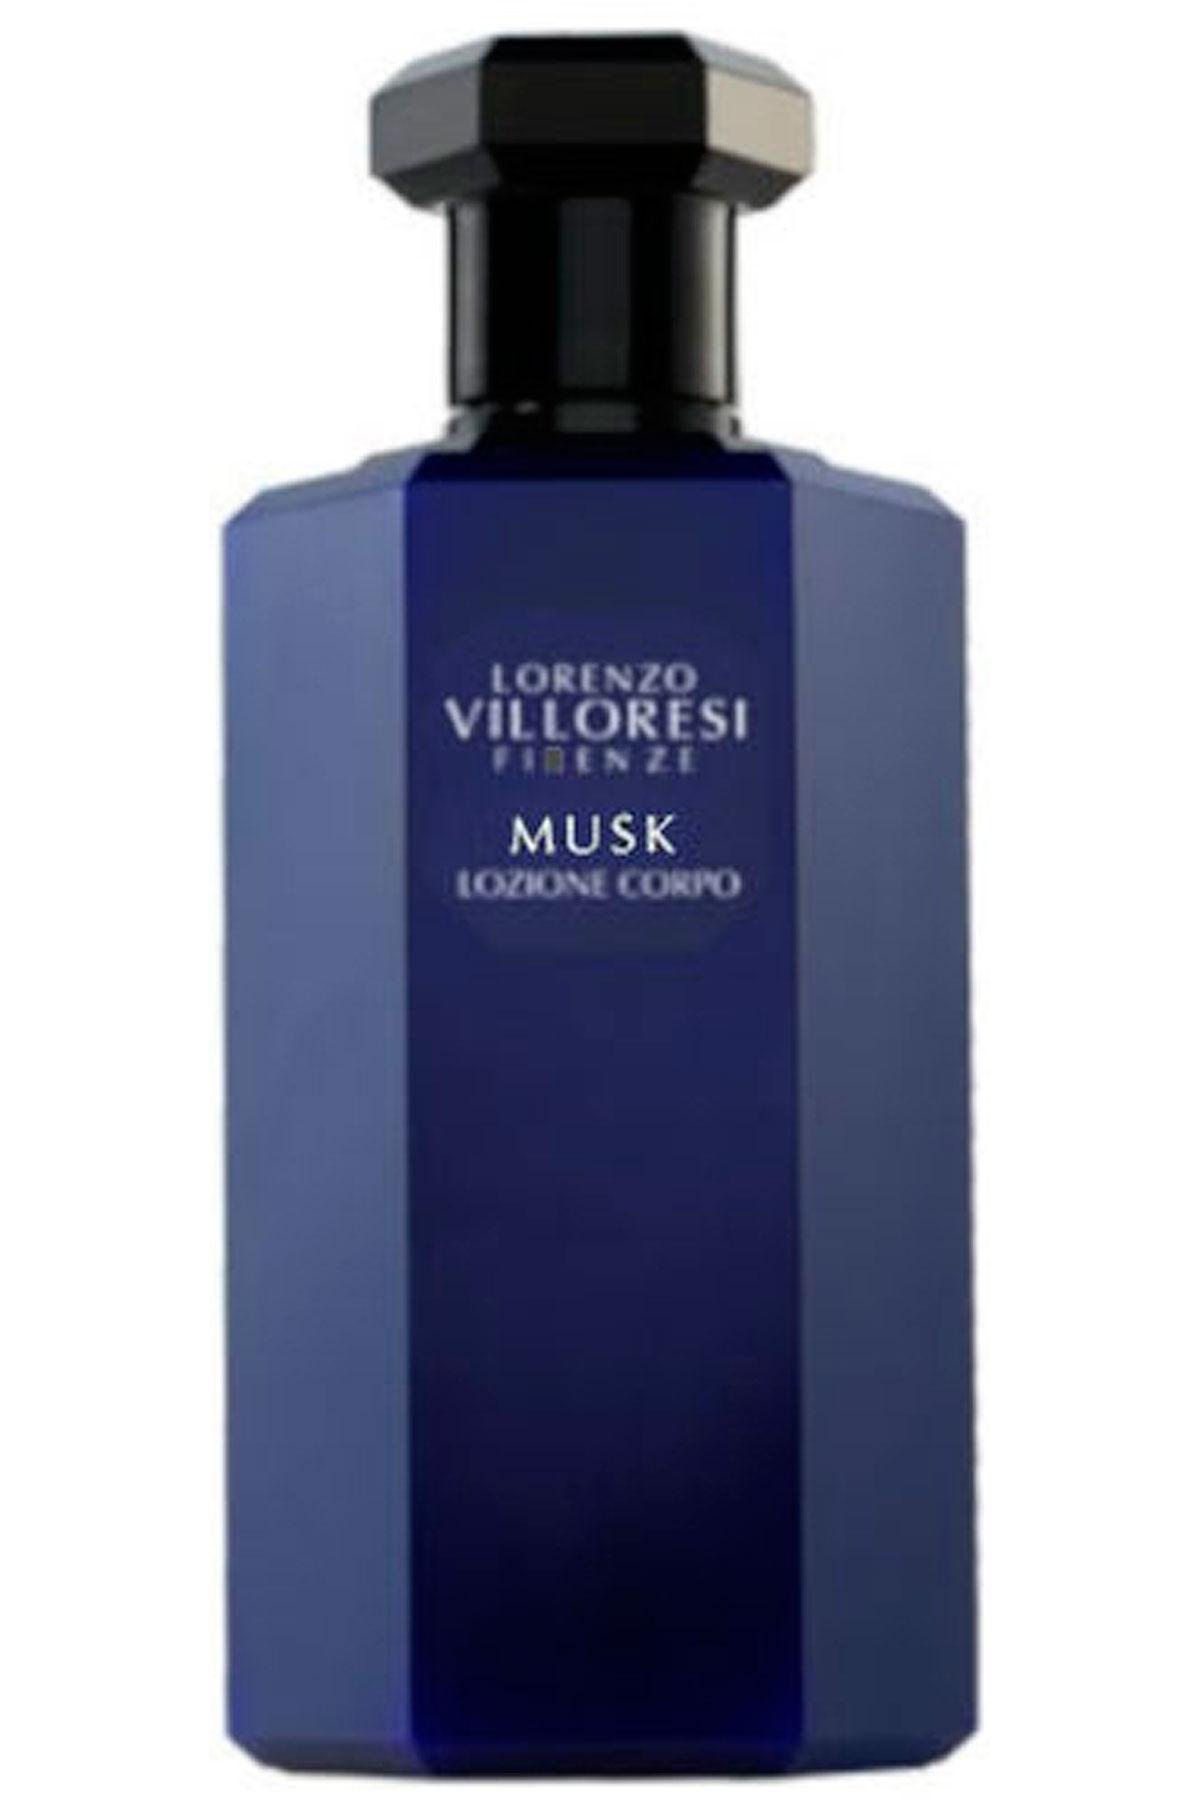 Lorenzo Villoresi Beauty for Women, Musk - Body Lotion - 250 Ml, 2019, 250 ml